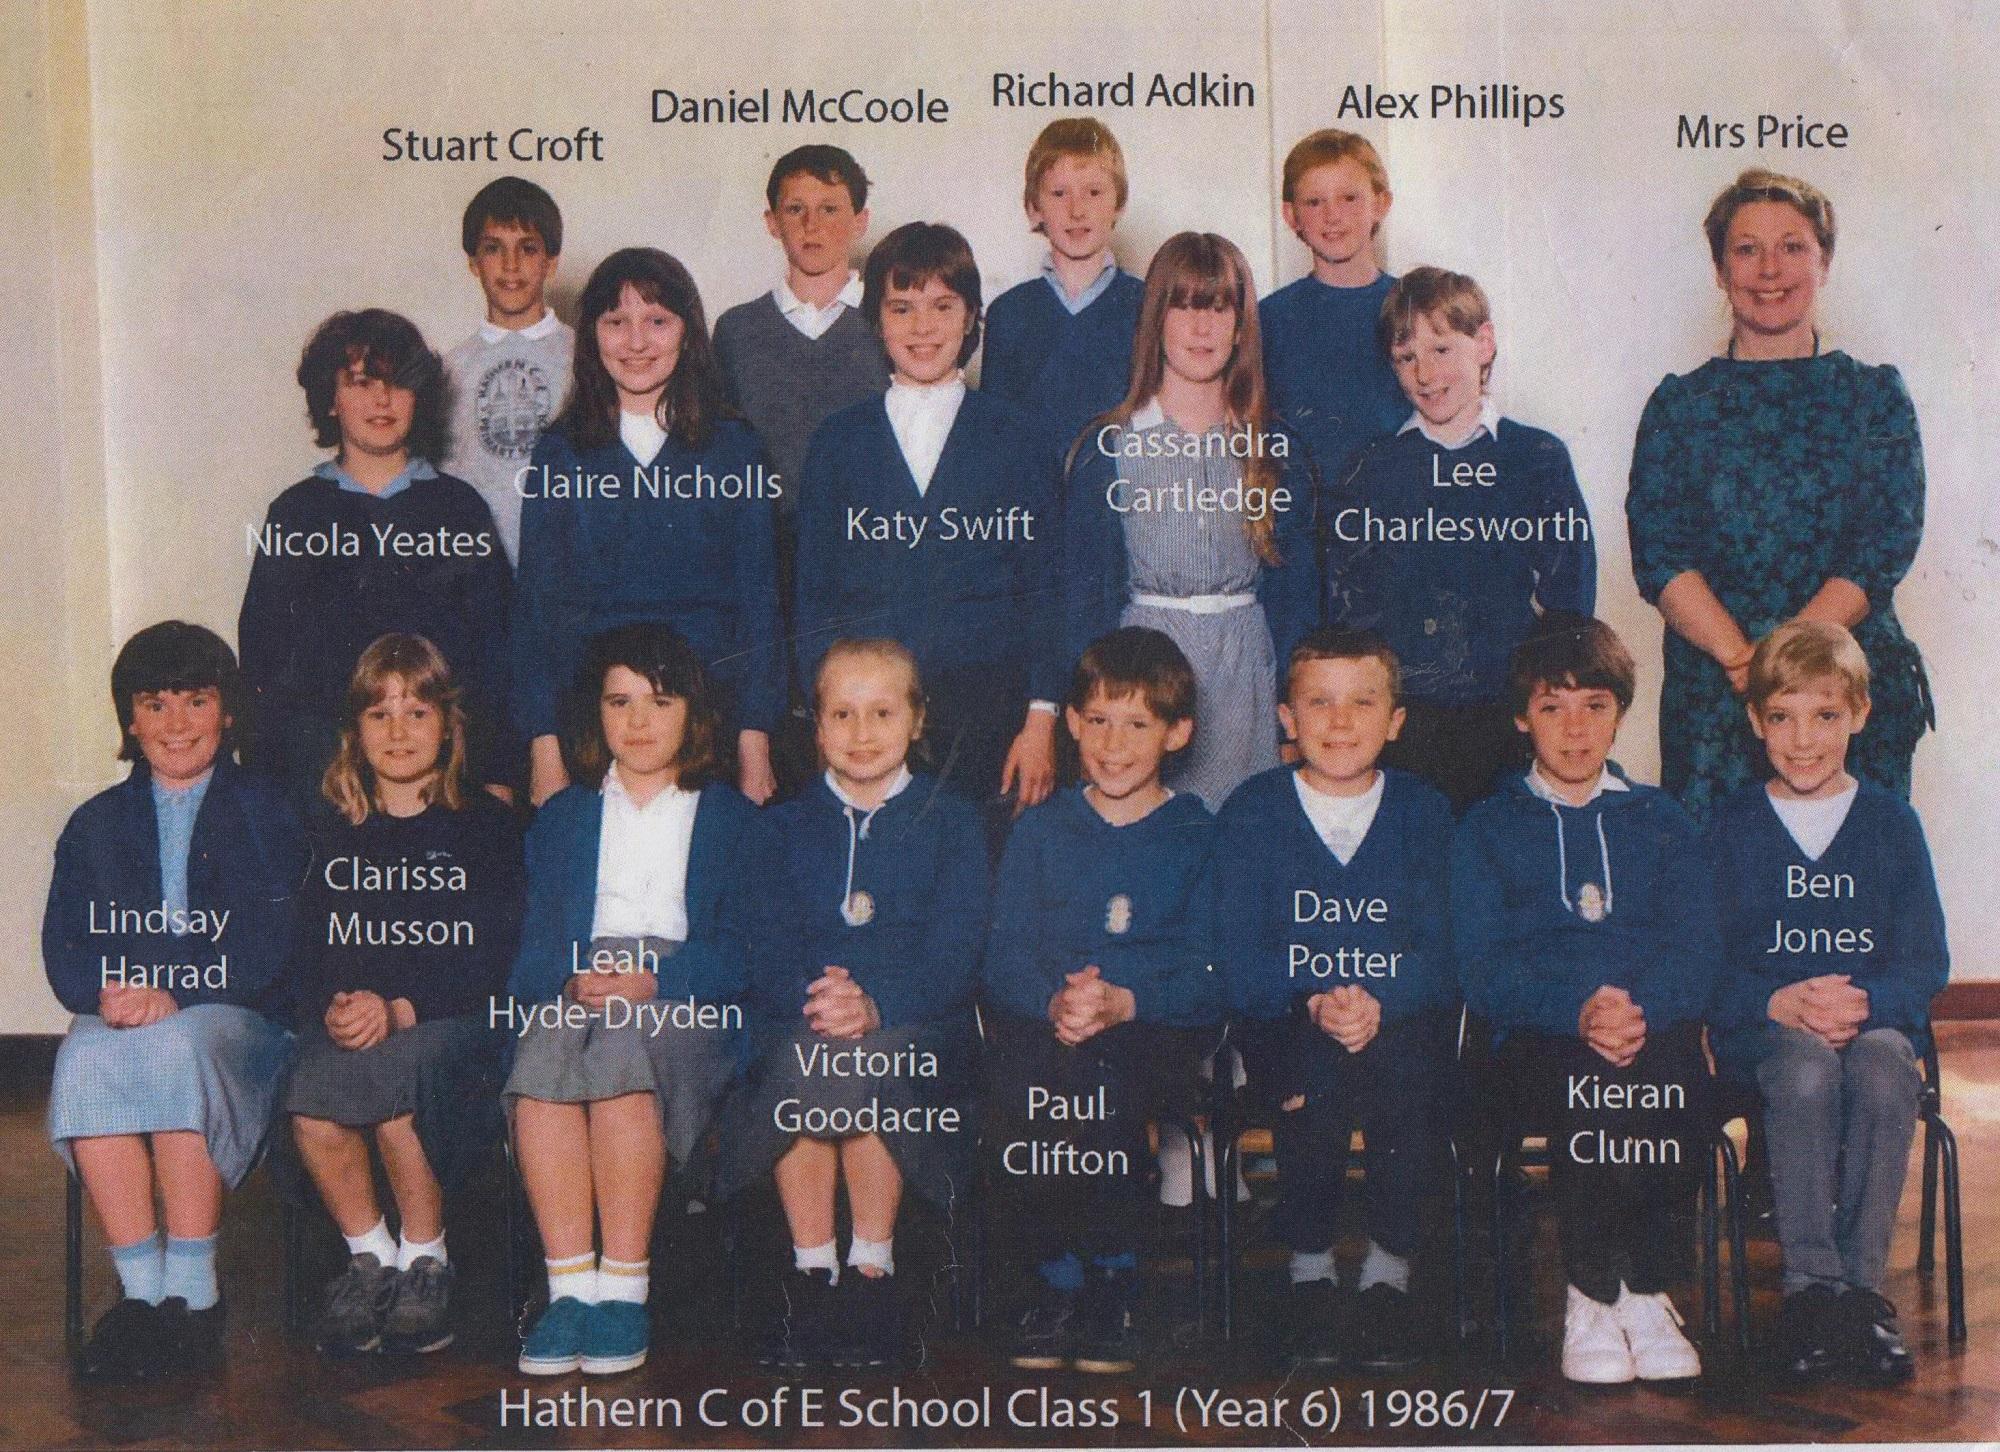 school_group_class_1_19861987_001.jpg